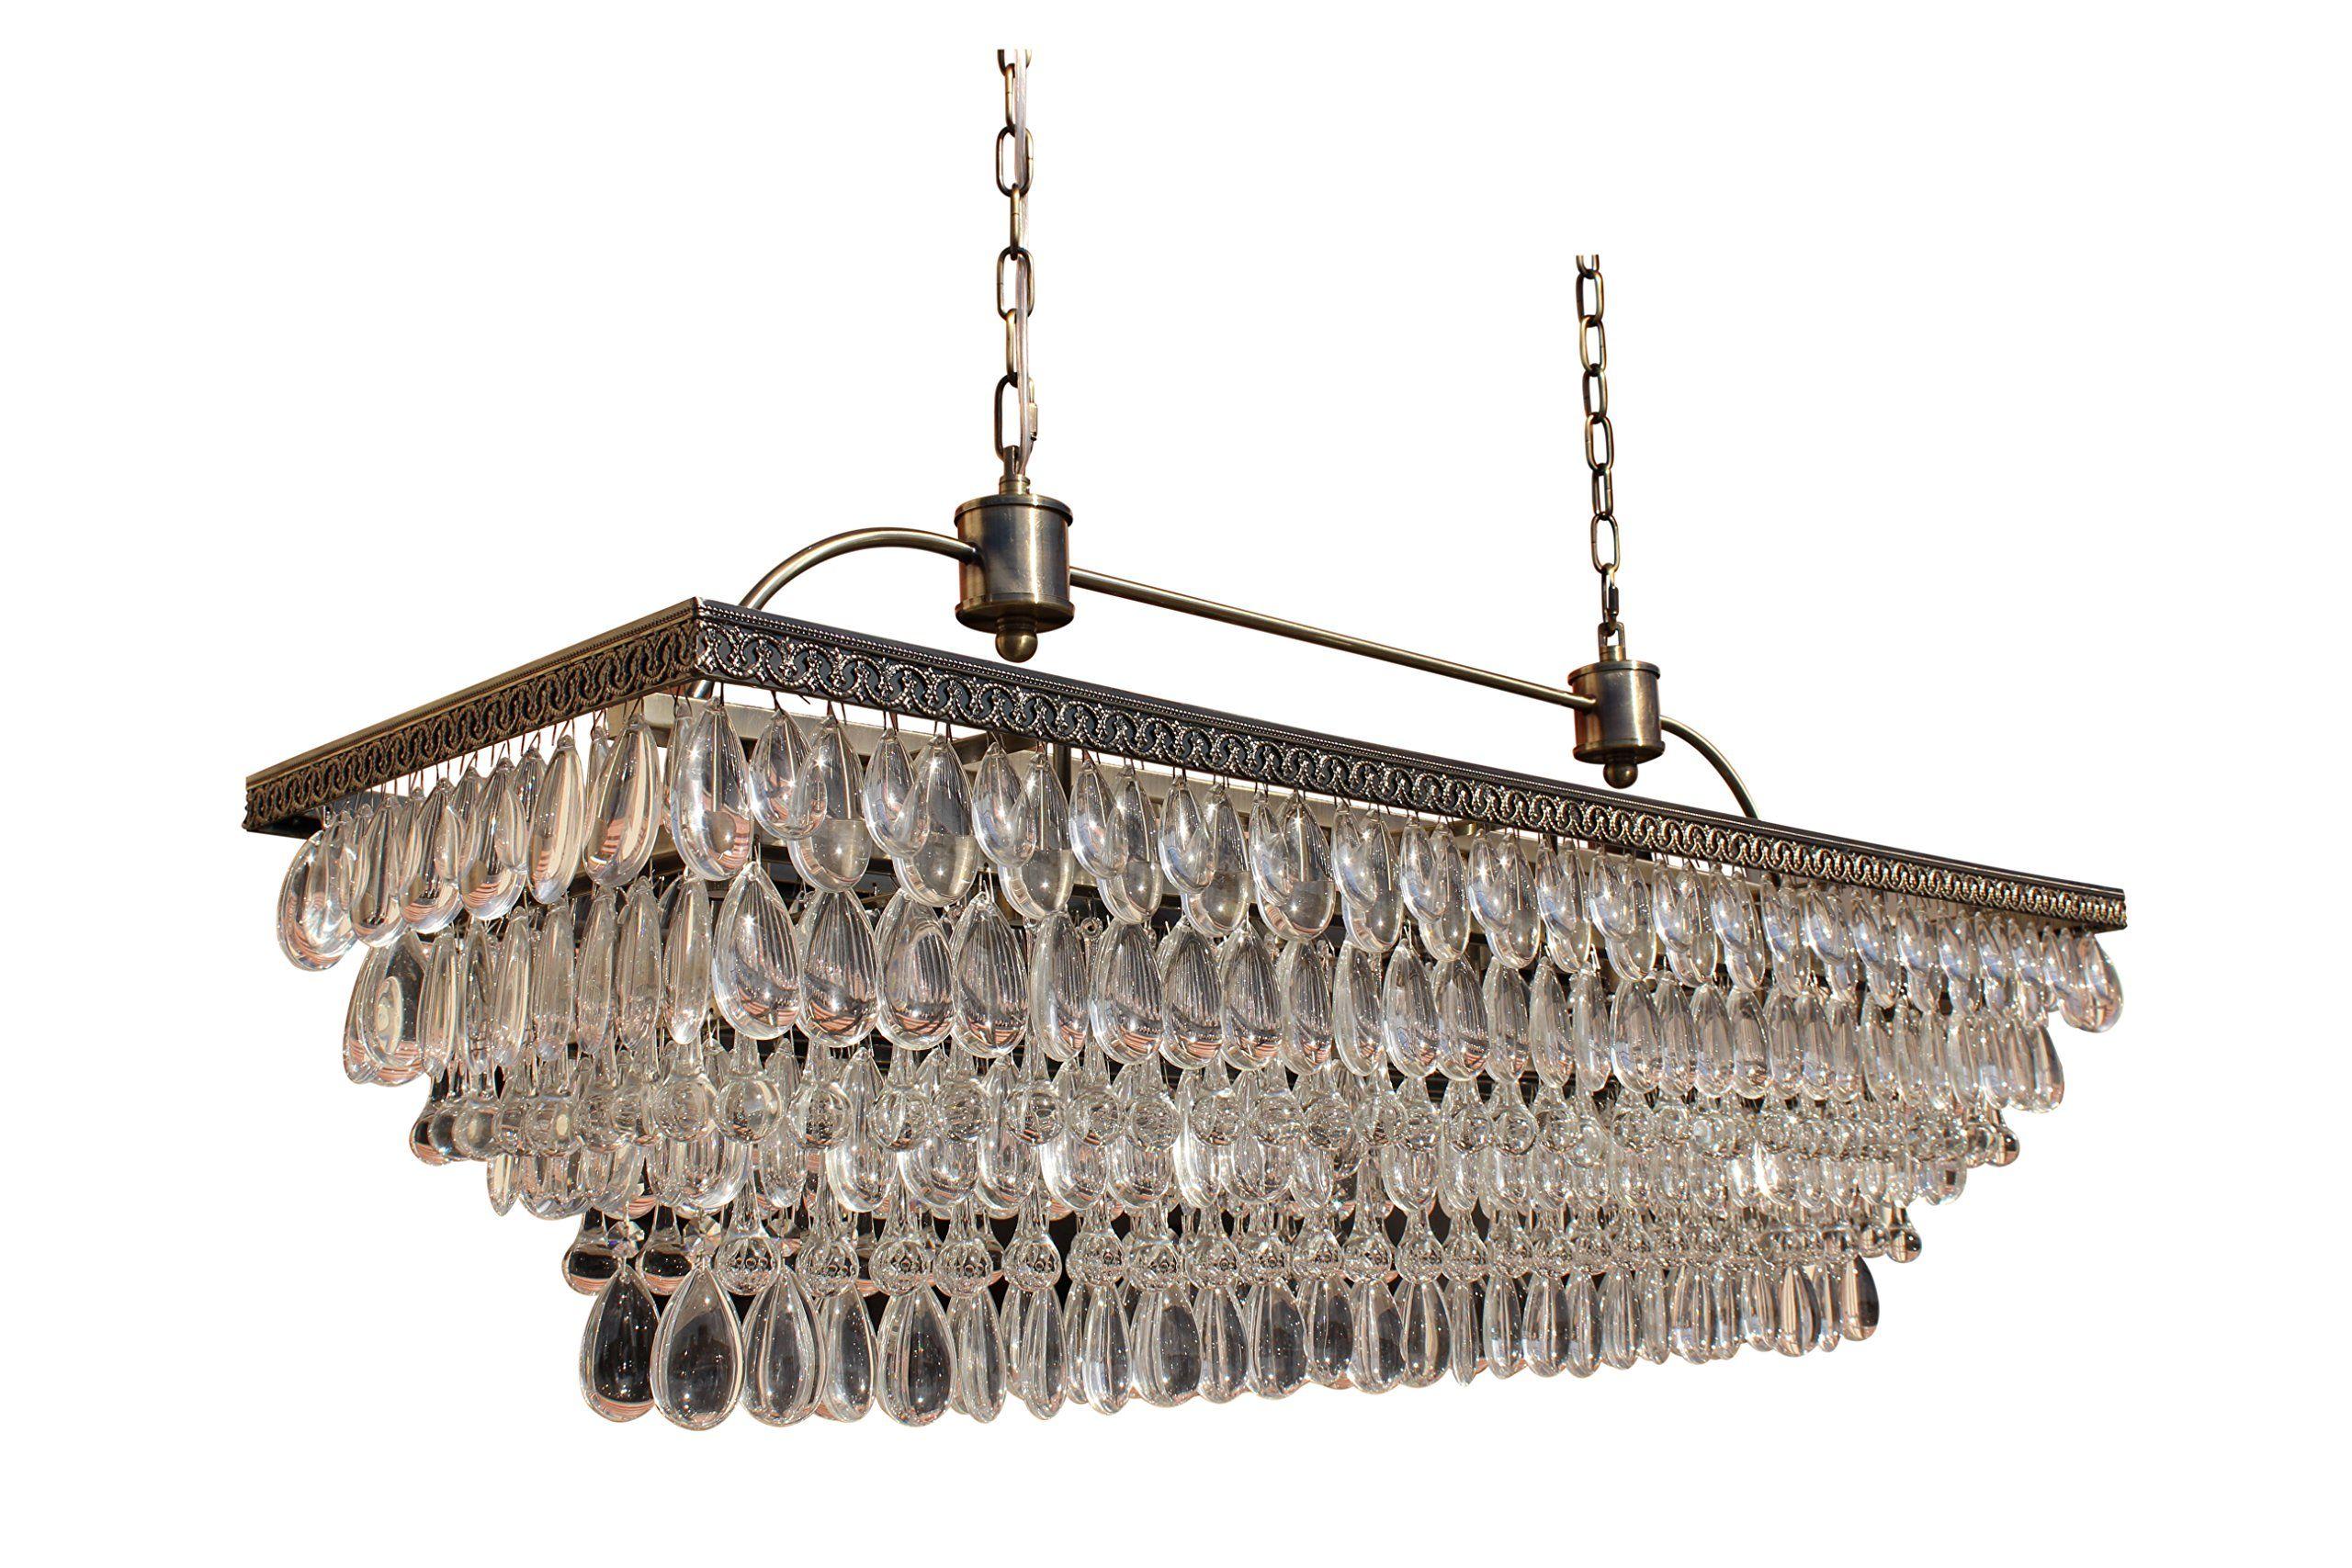 The Weston 40 Inch Rectangular Glass Drop Crystal Chandelier